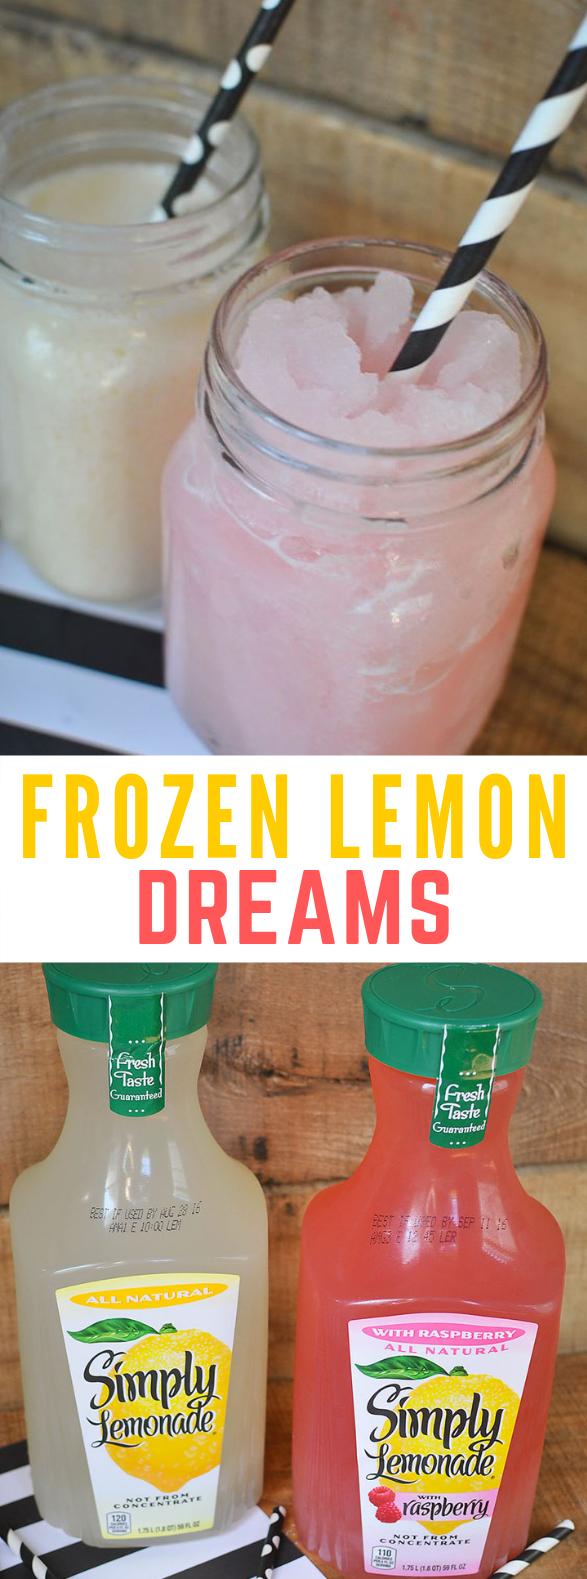 SIMPLE SUMMER TREAT: FROZEN LEMON DREAMS #Lemon #Summer